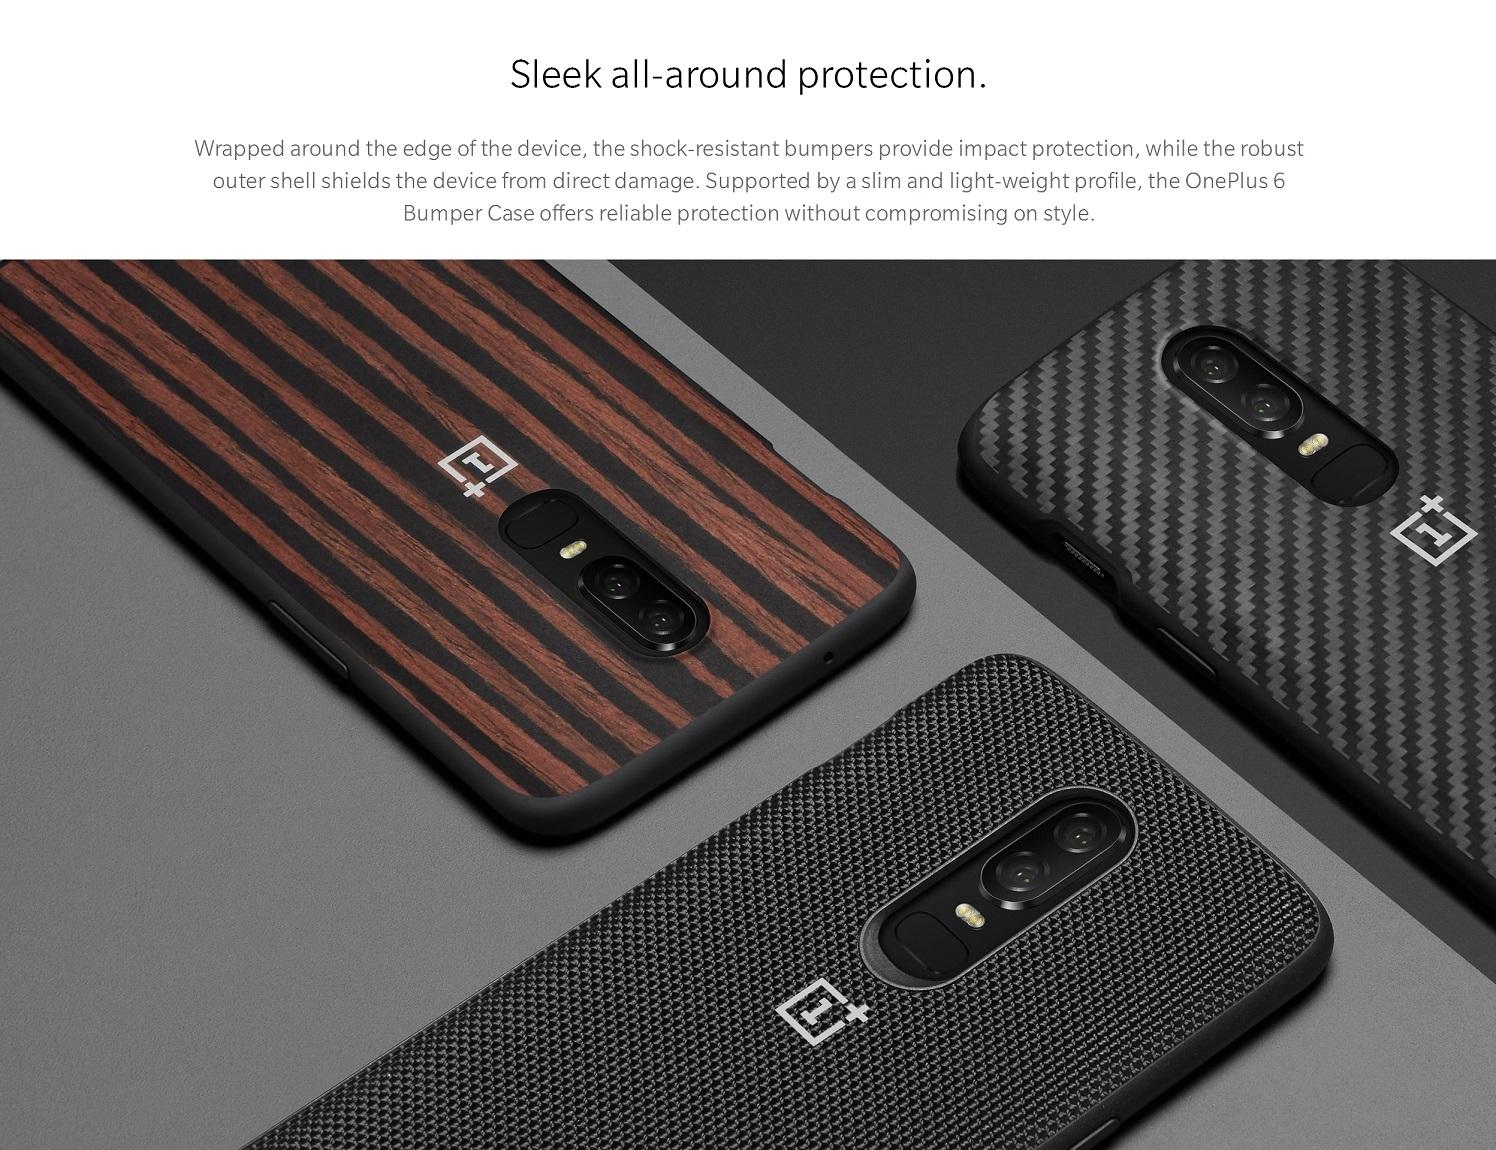 OnePlus 6 Bumper Case